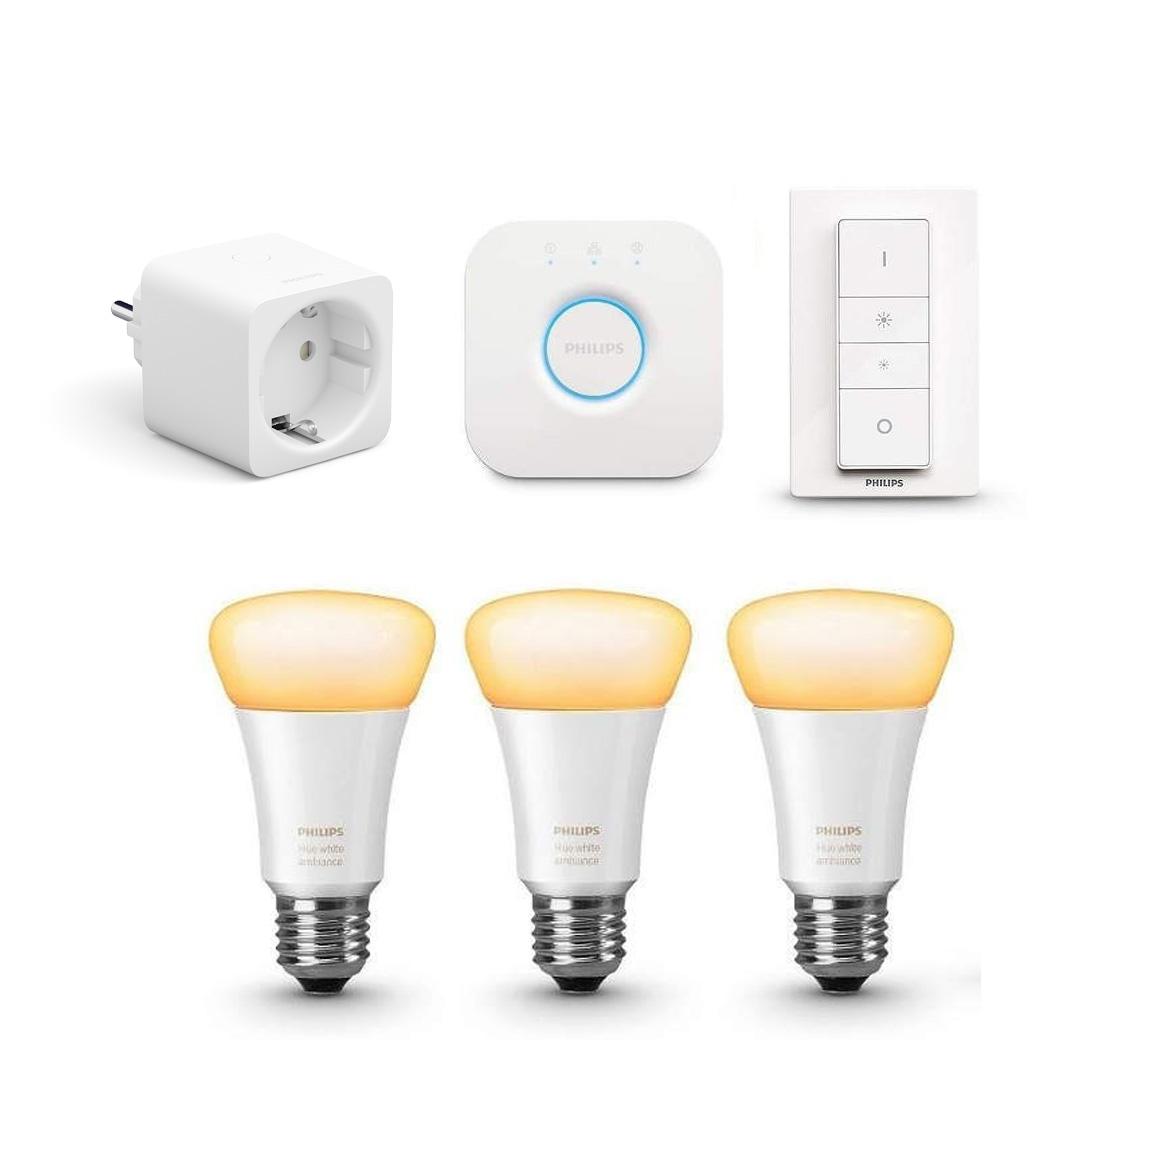 Philips Hue White Ambiance E27 Bluetooth Starter Kit + Smarte Steckdose